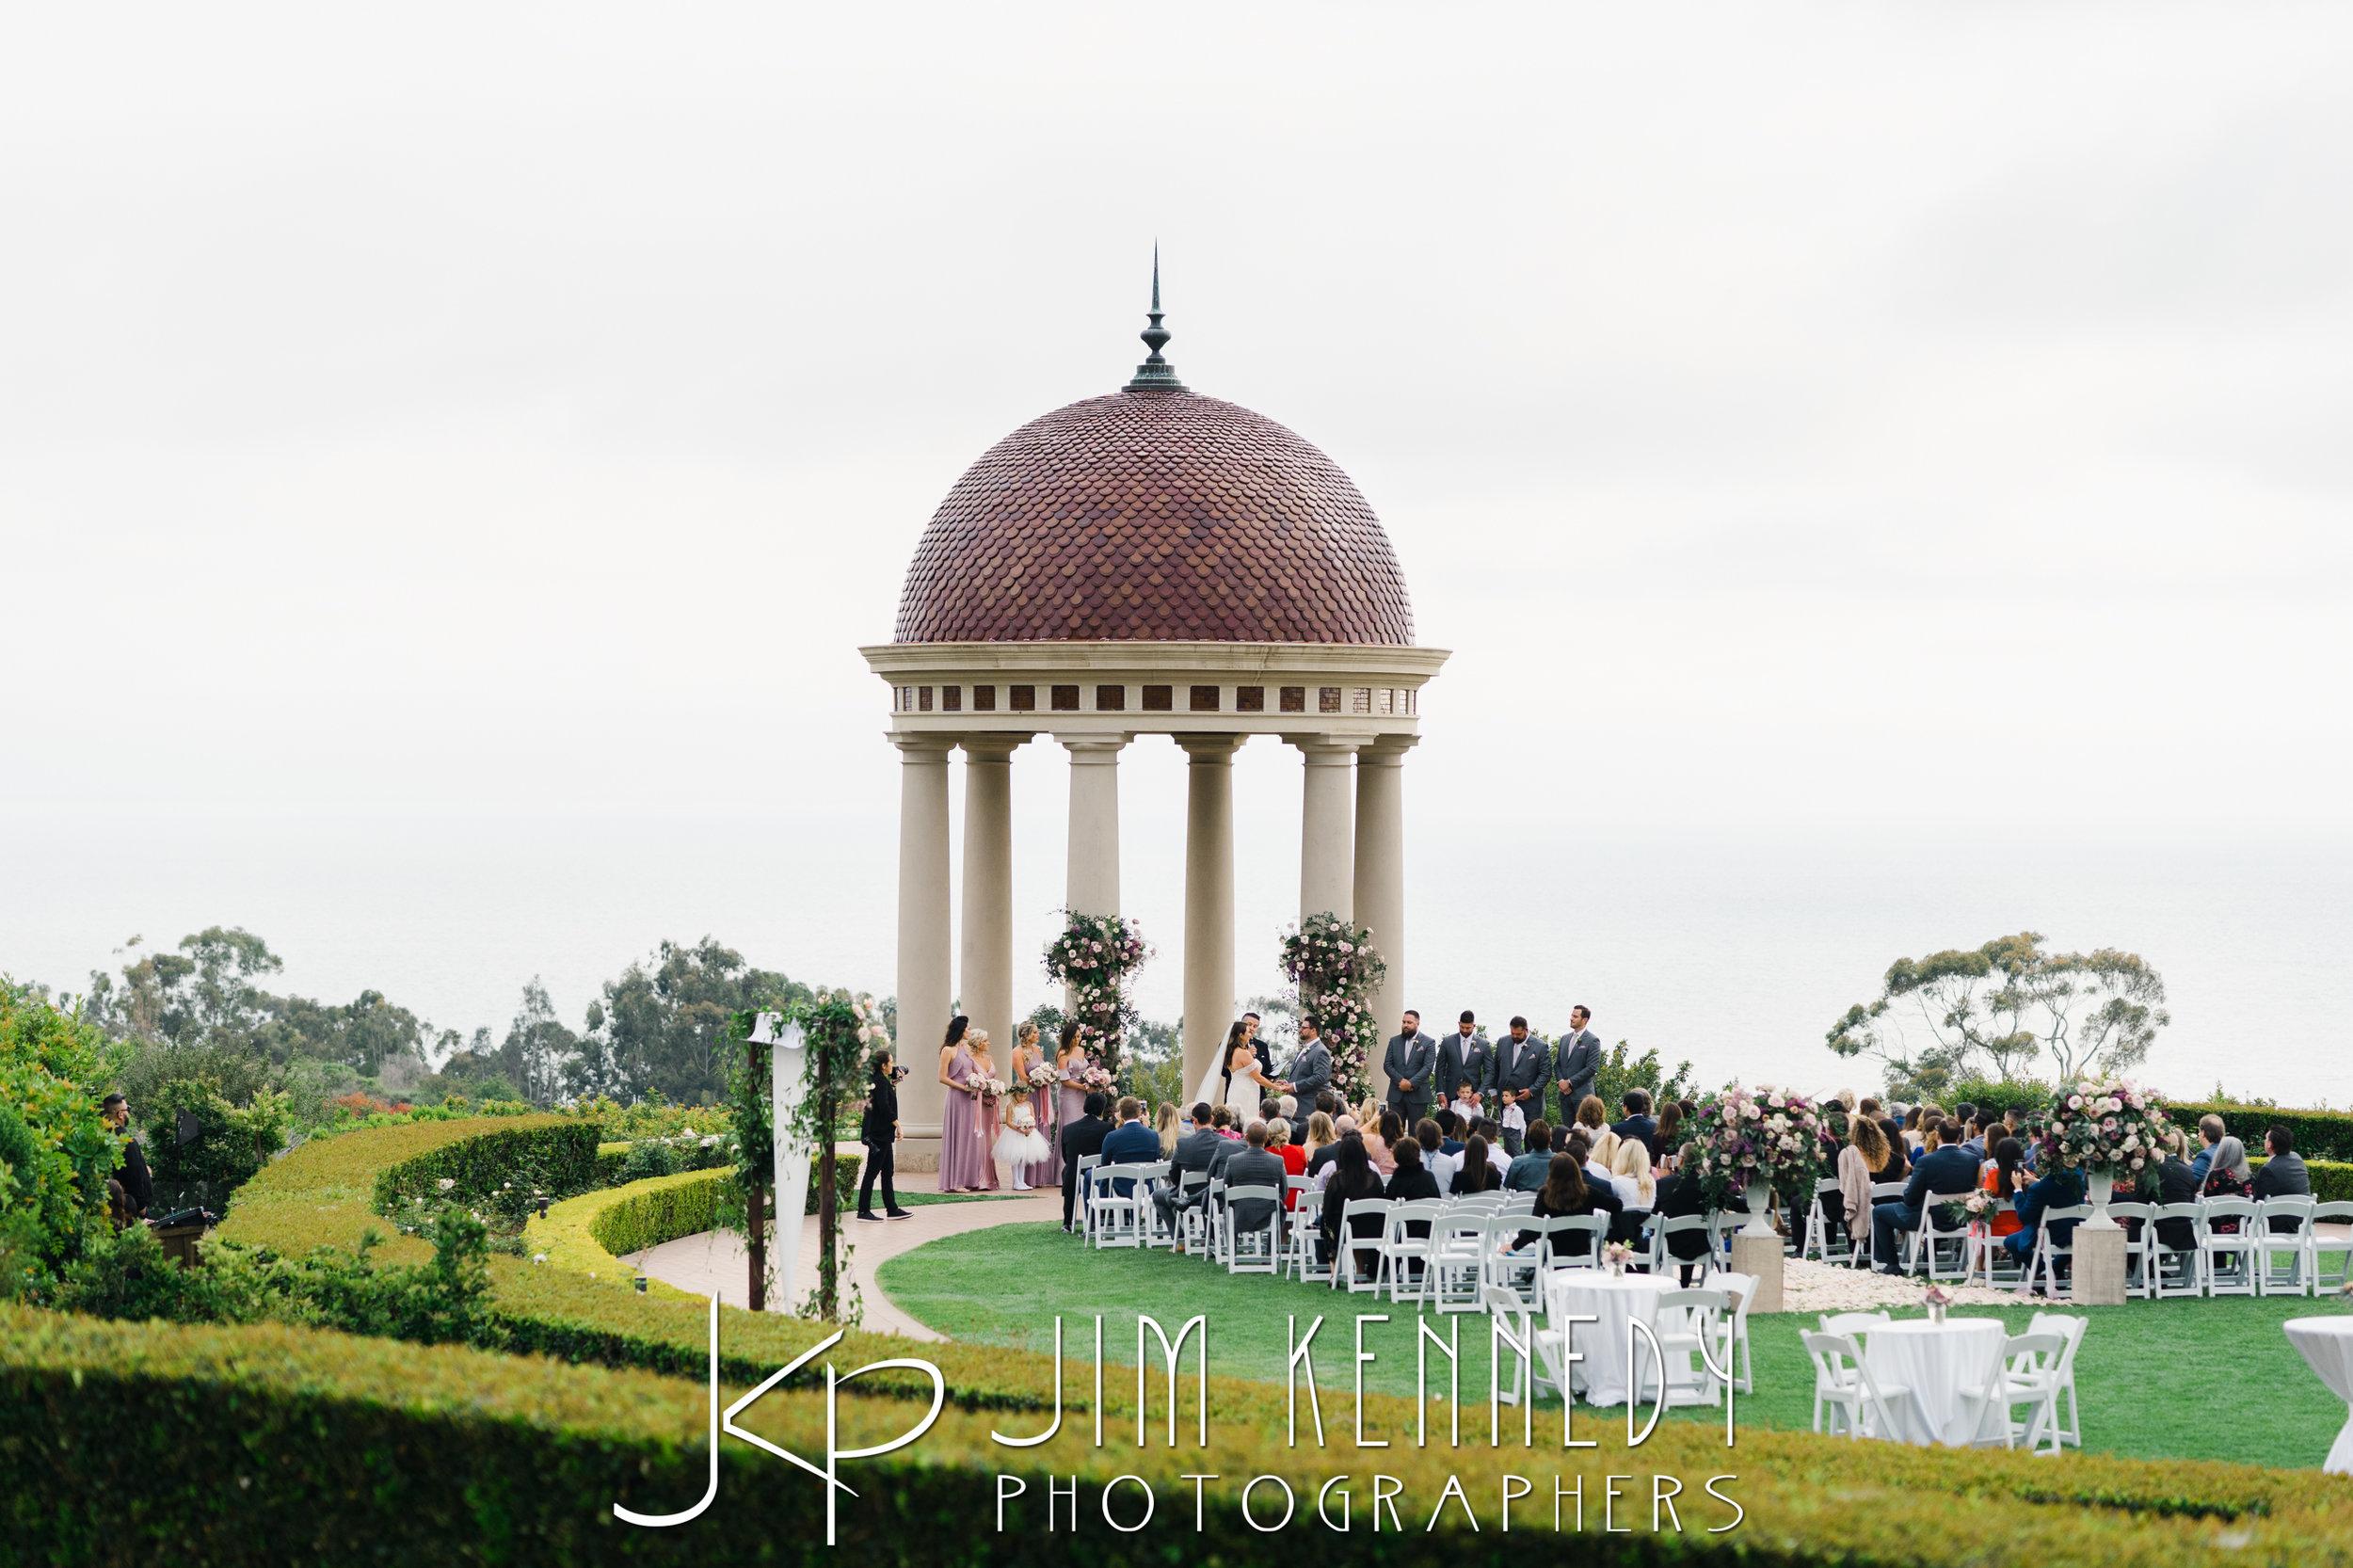 pelican-hill-wedding-jim-kenedy-photographers_0121.JPG